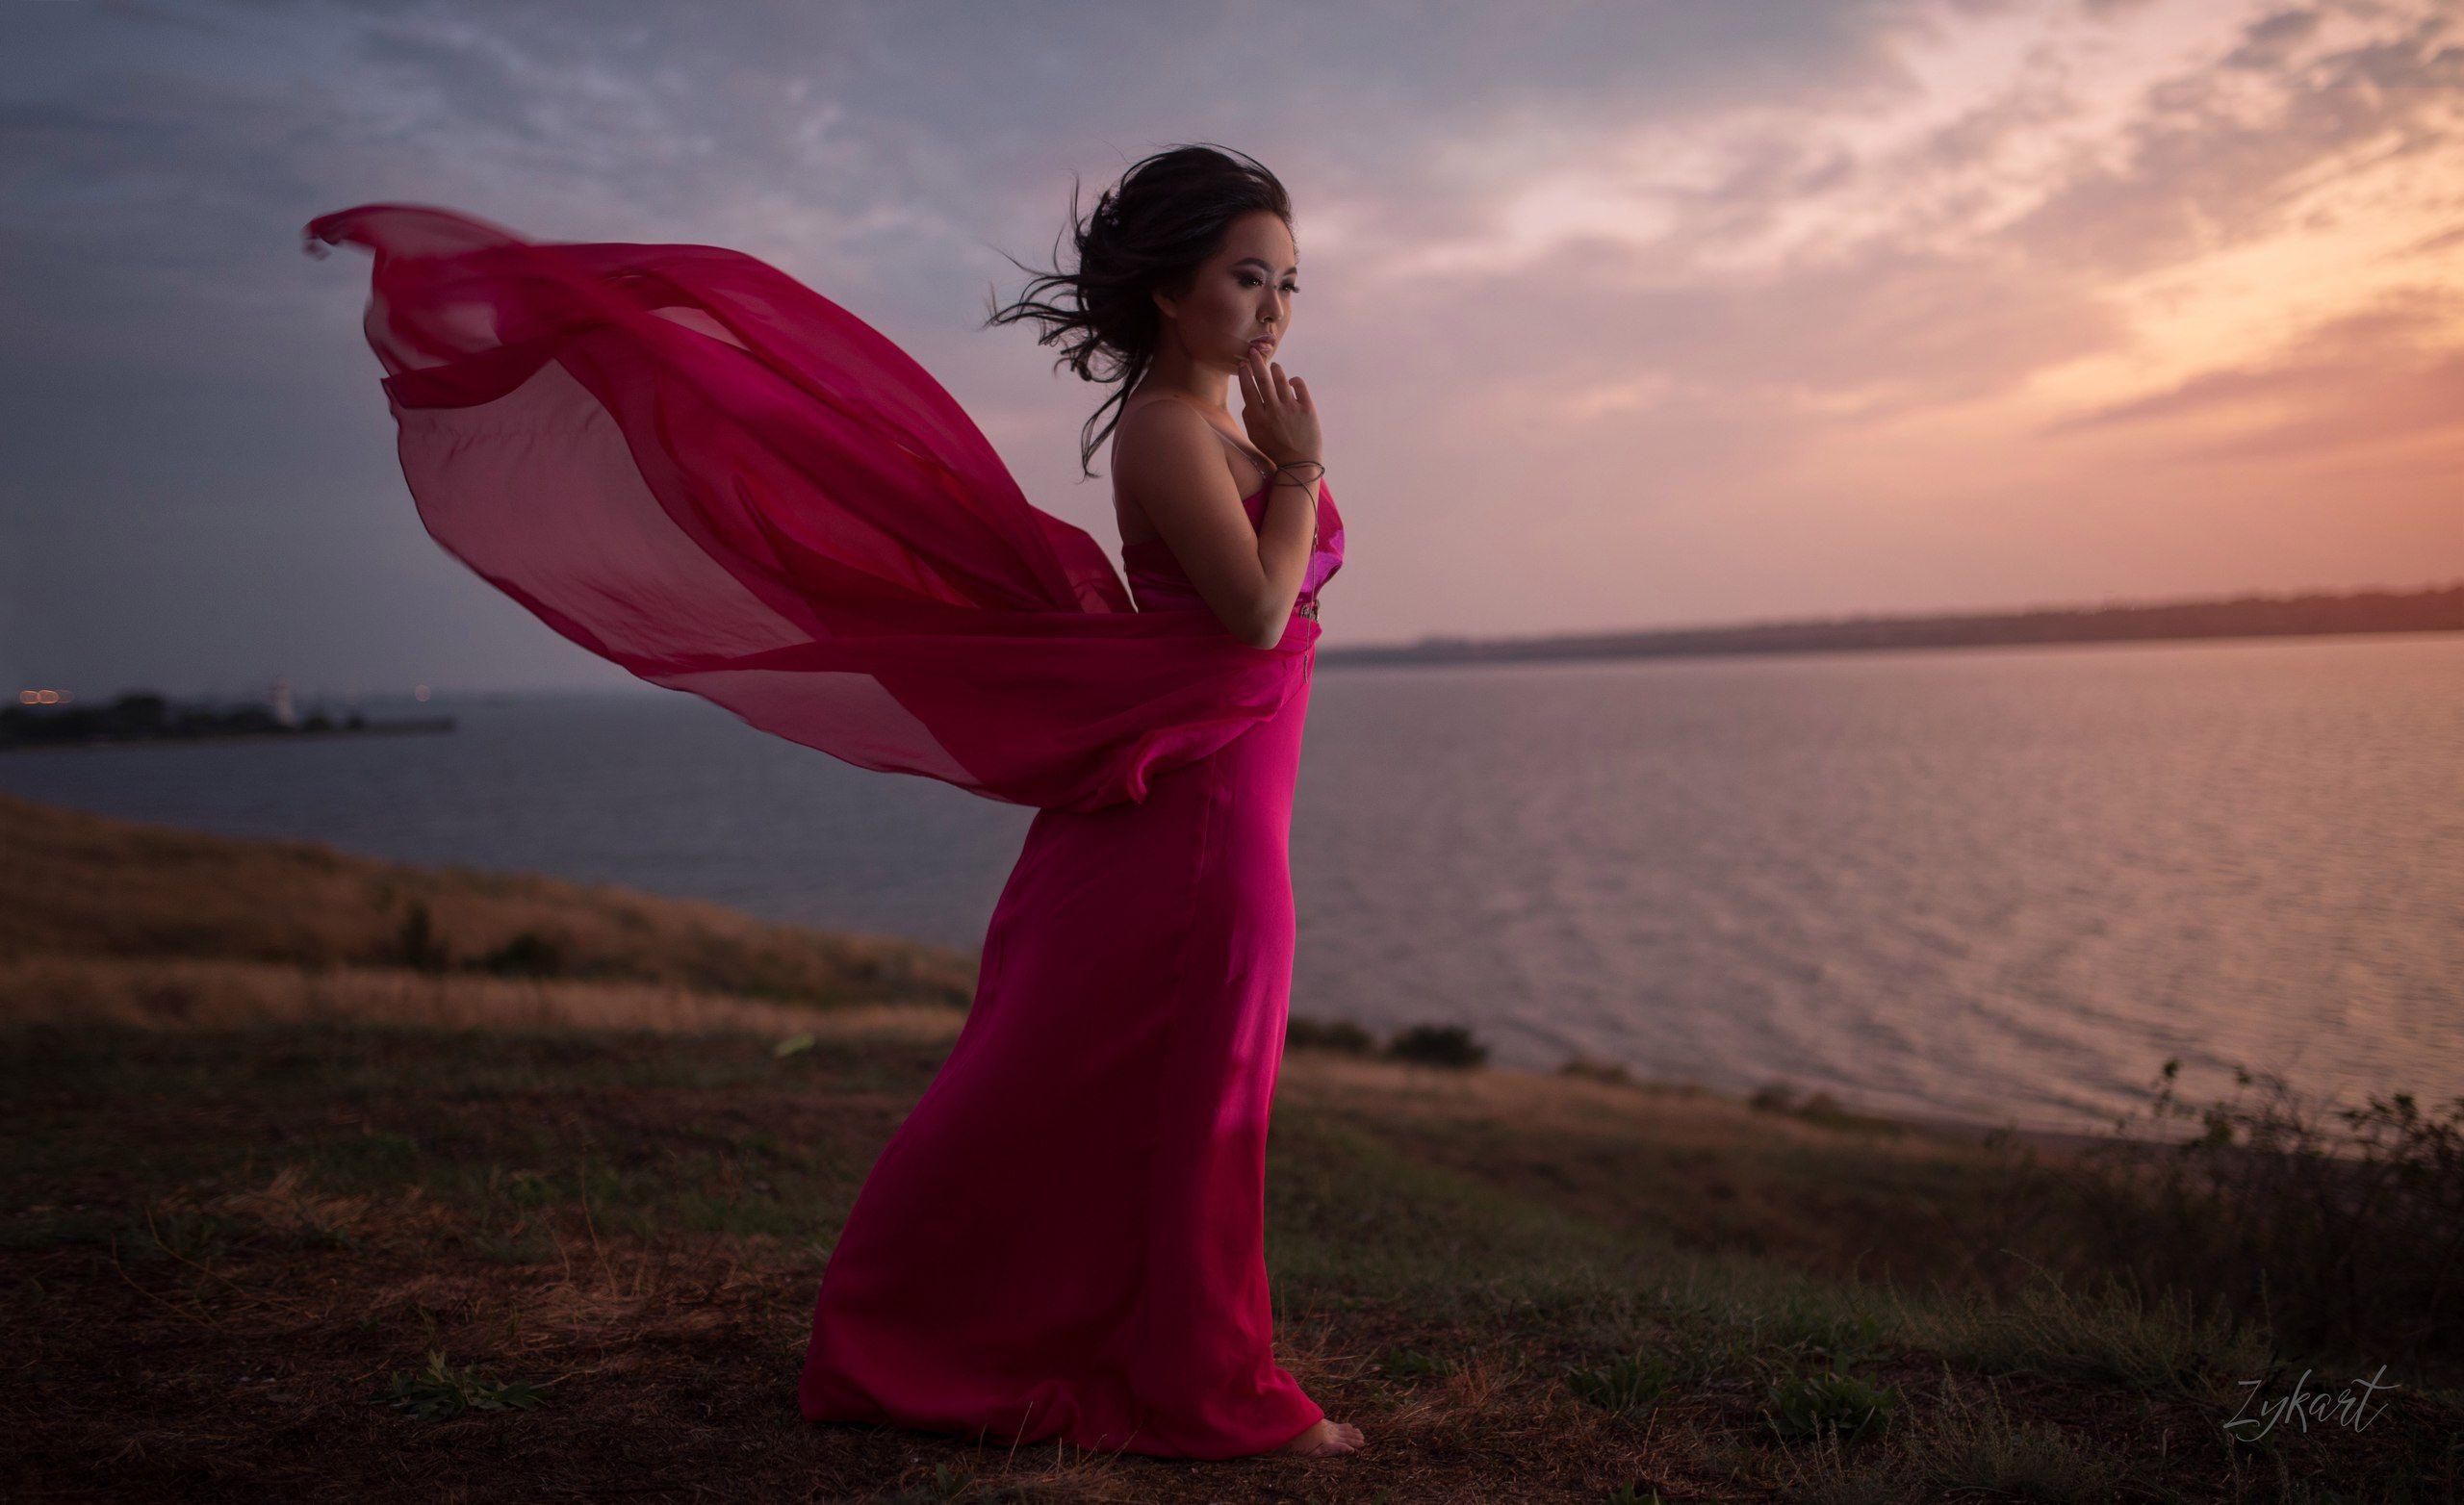 woman dress water wind nature pink beautiful волны девушка ветер фото_недели фото_дня лучшее_фото weaves природа красота, Маргарита Жуковкая